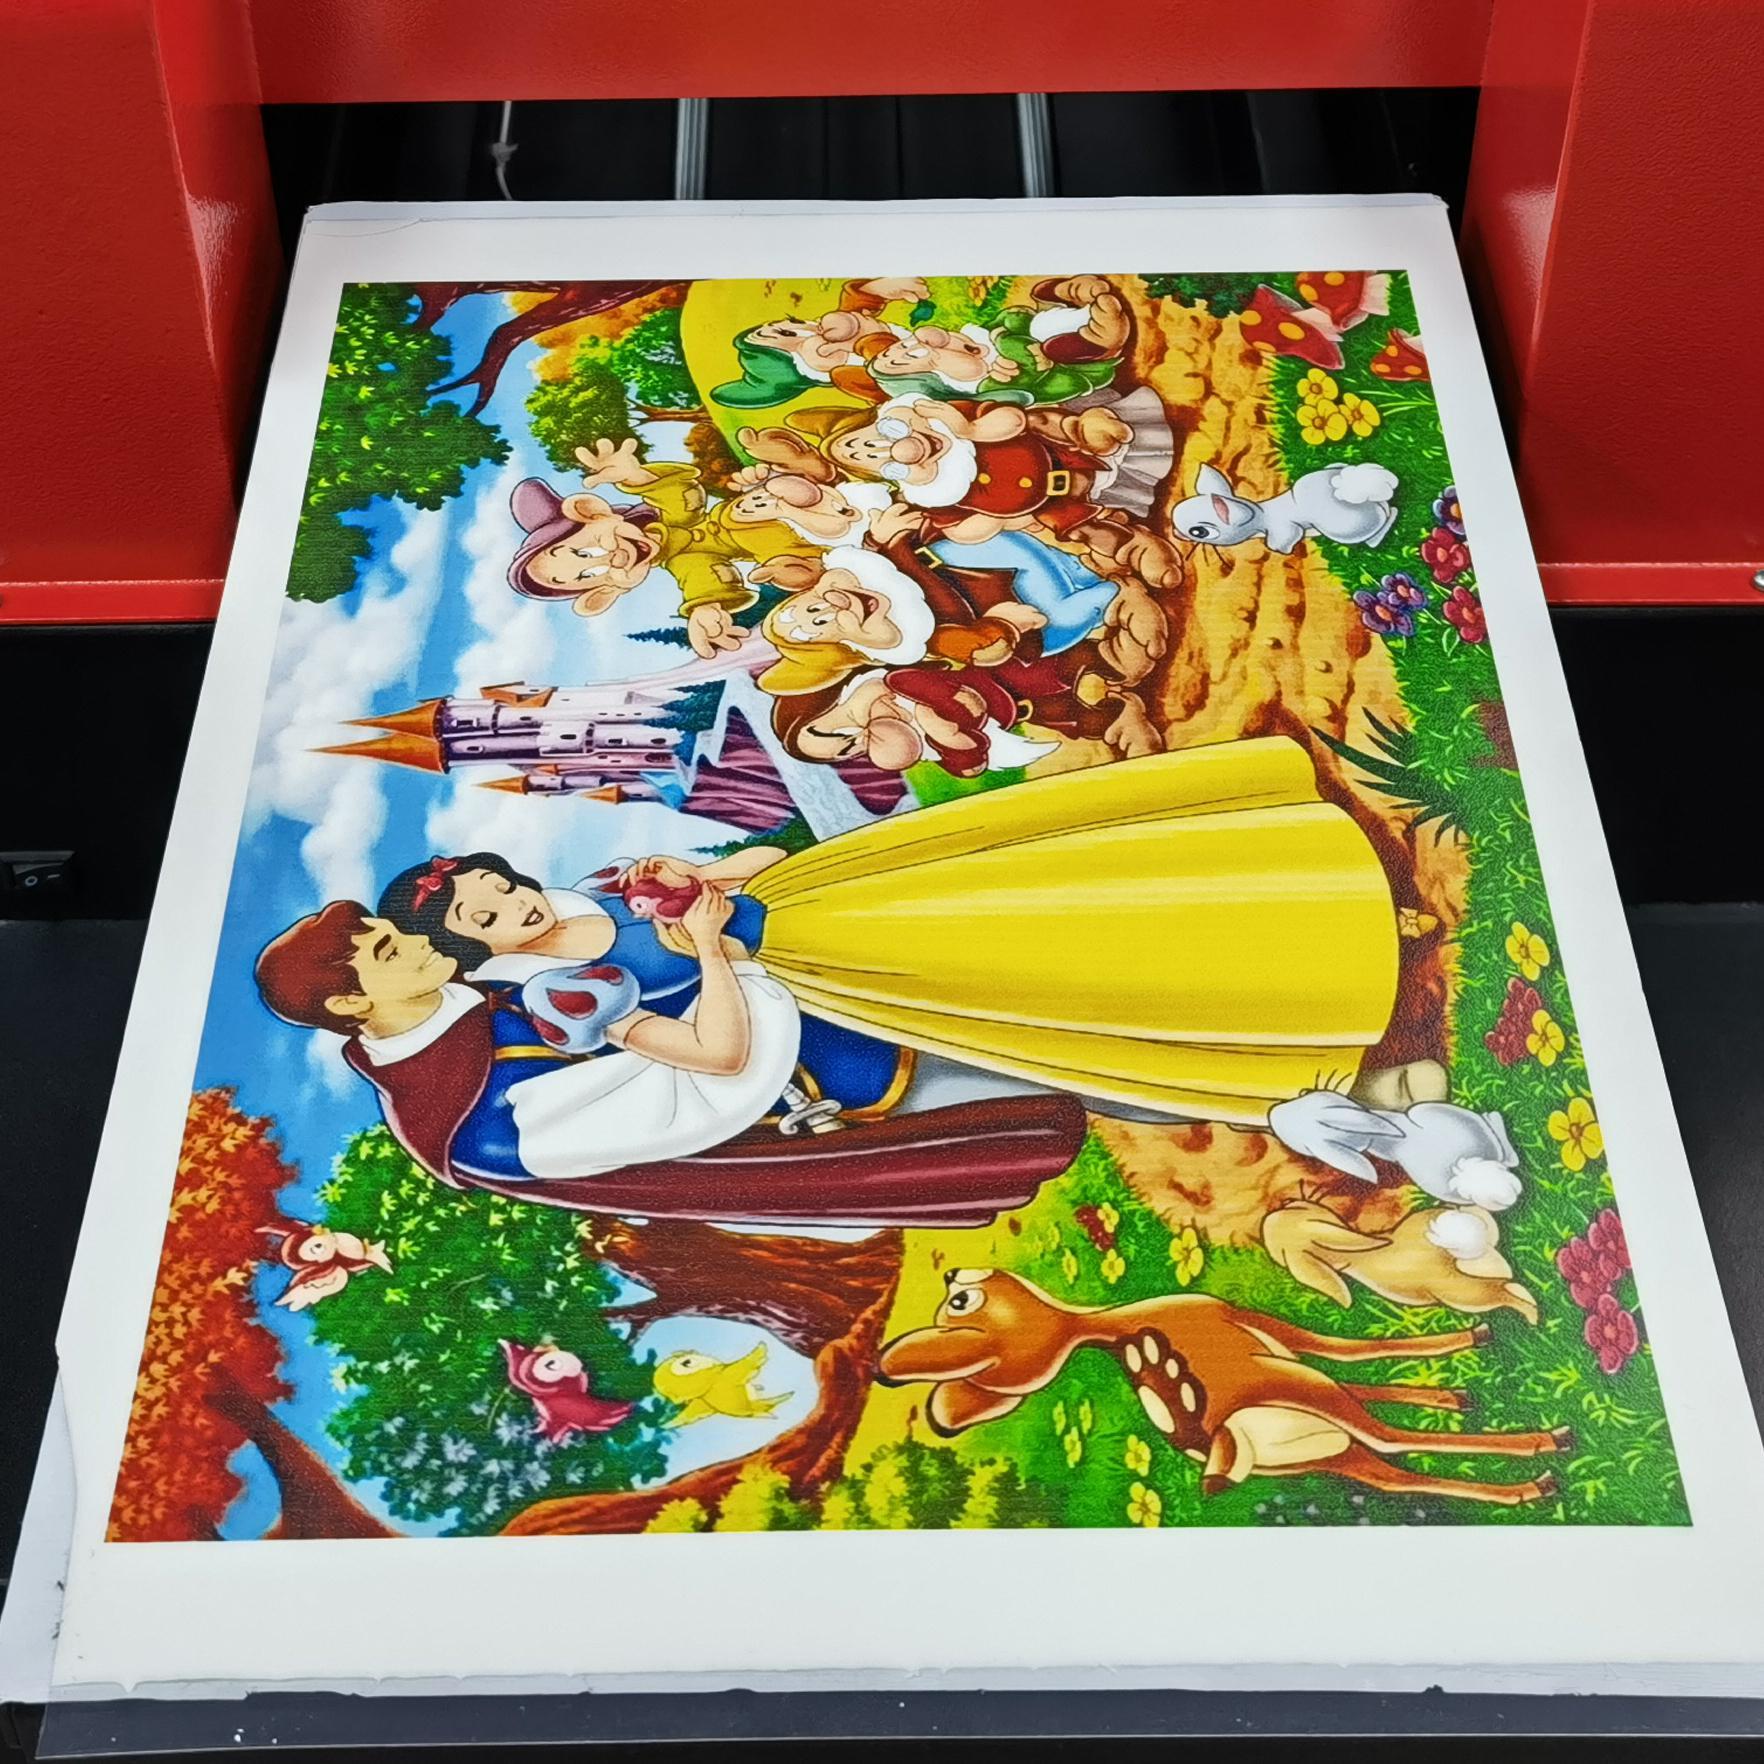 A4 Food Printer Fondant Cake Macaroons Food Printer with edible ink 4